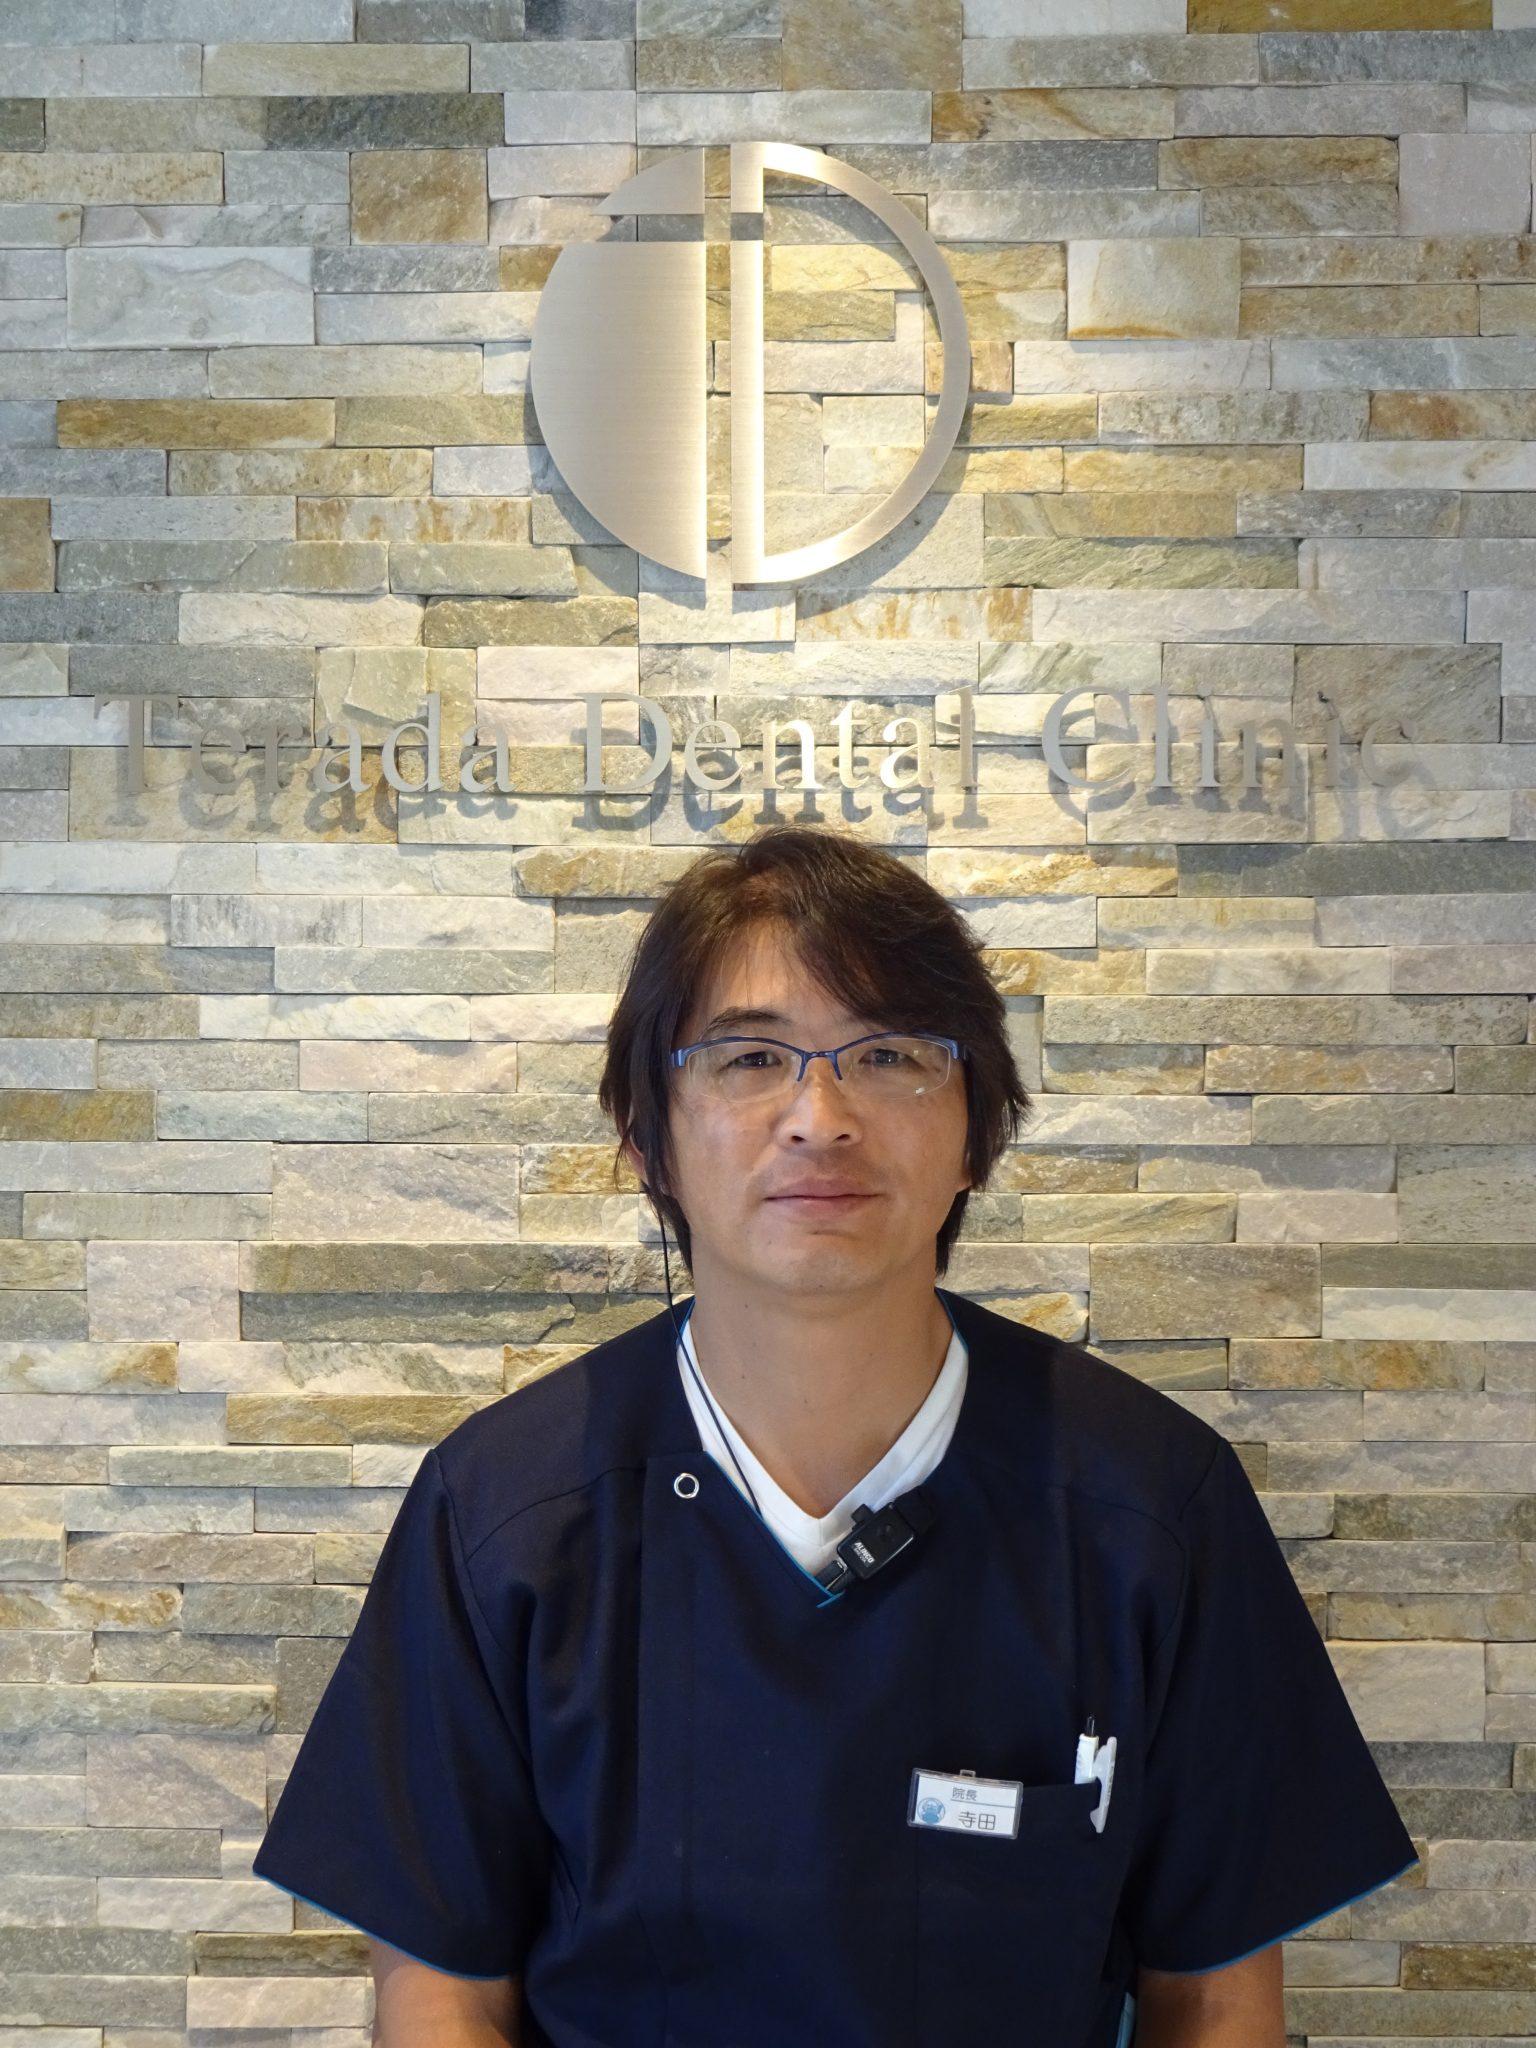 院長 寺田 英史 Terada Hidefumi